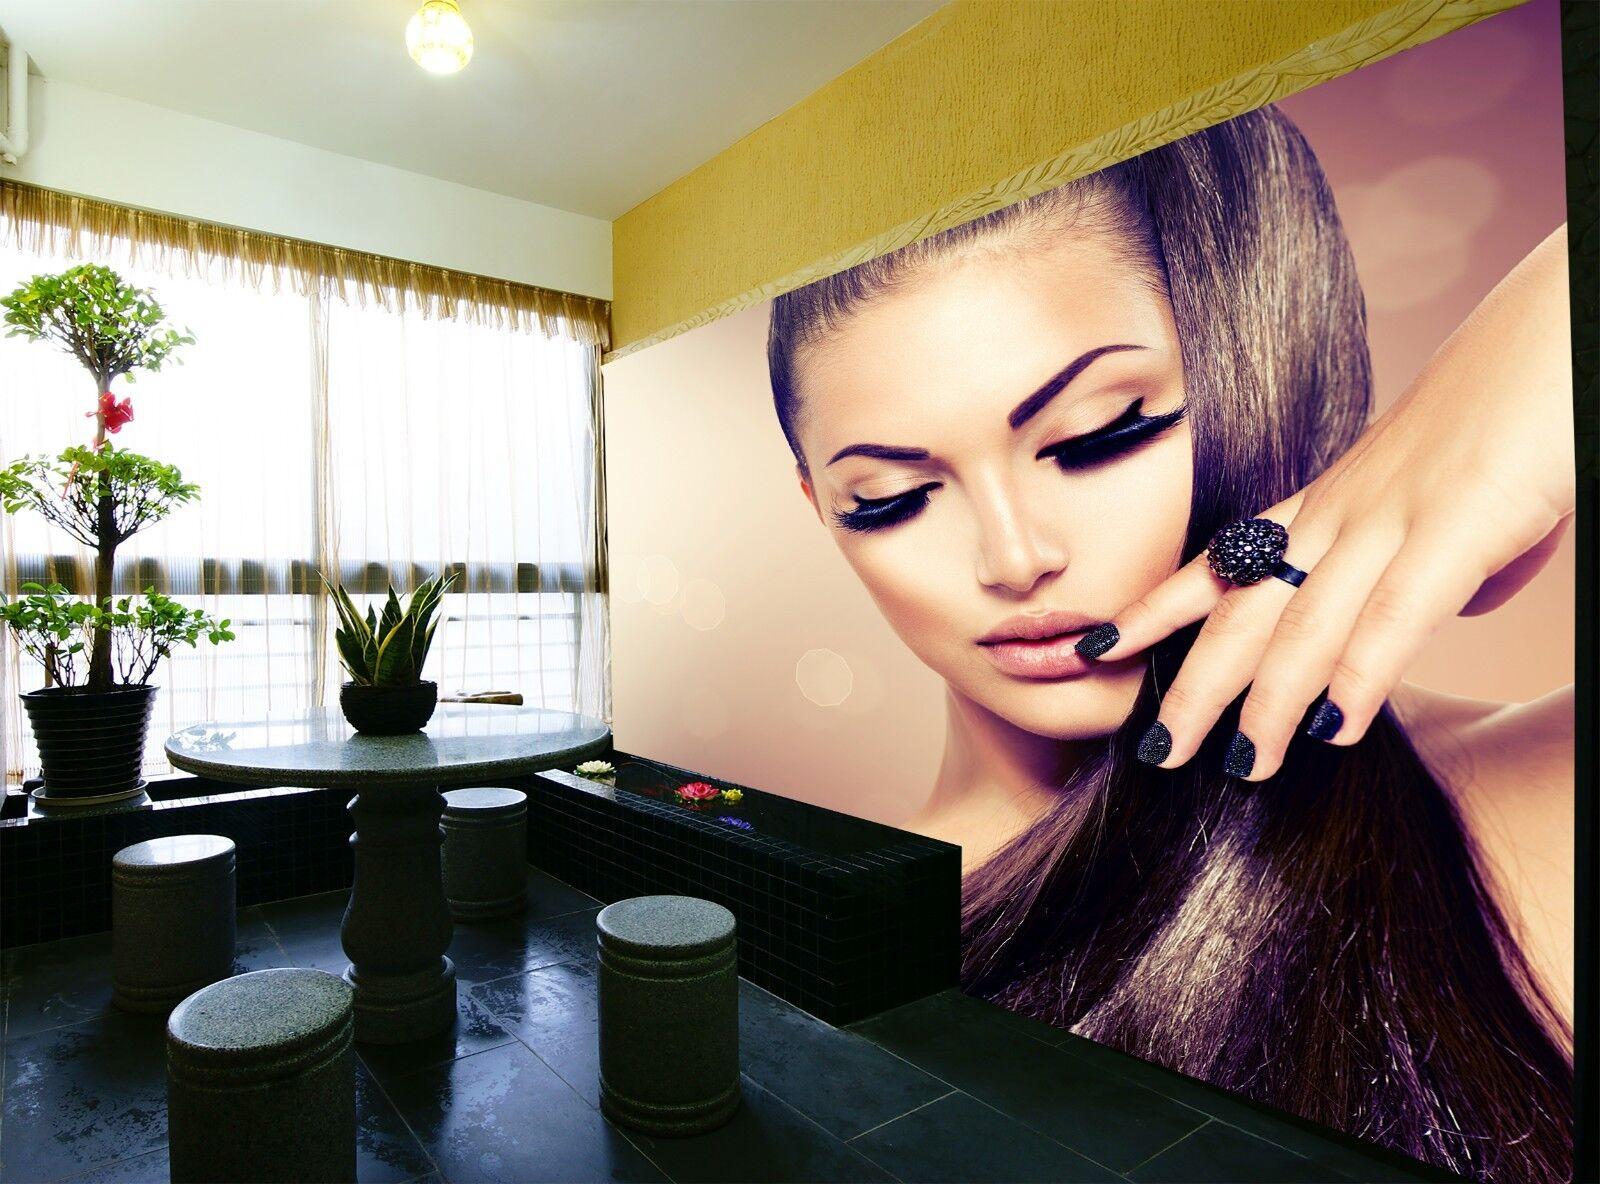 Wonderful Hair  Photo Wallpaper Wall Mural DECOR Paper Poster Free Paste